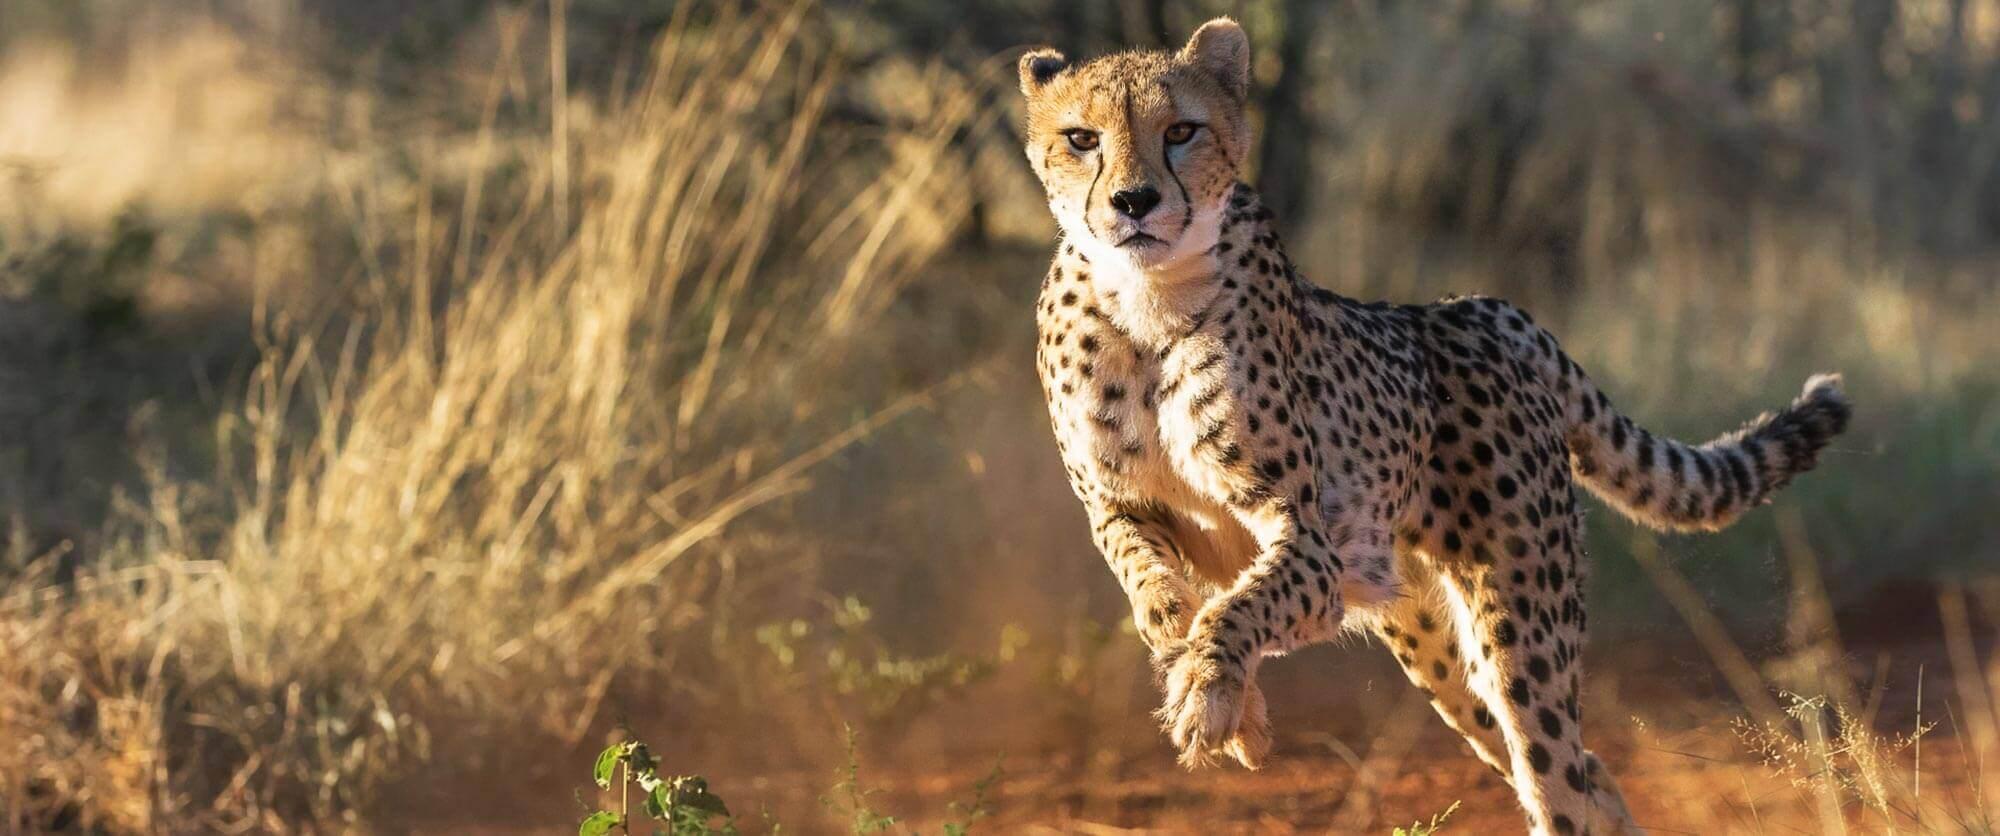 Cheetah at Okonjima Nature Reserve, Namibia - AfriCat Foundation - Namibia Highlights Vacation